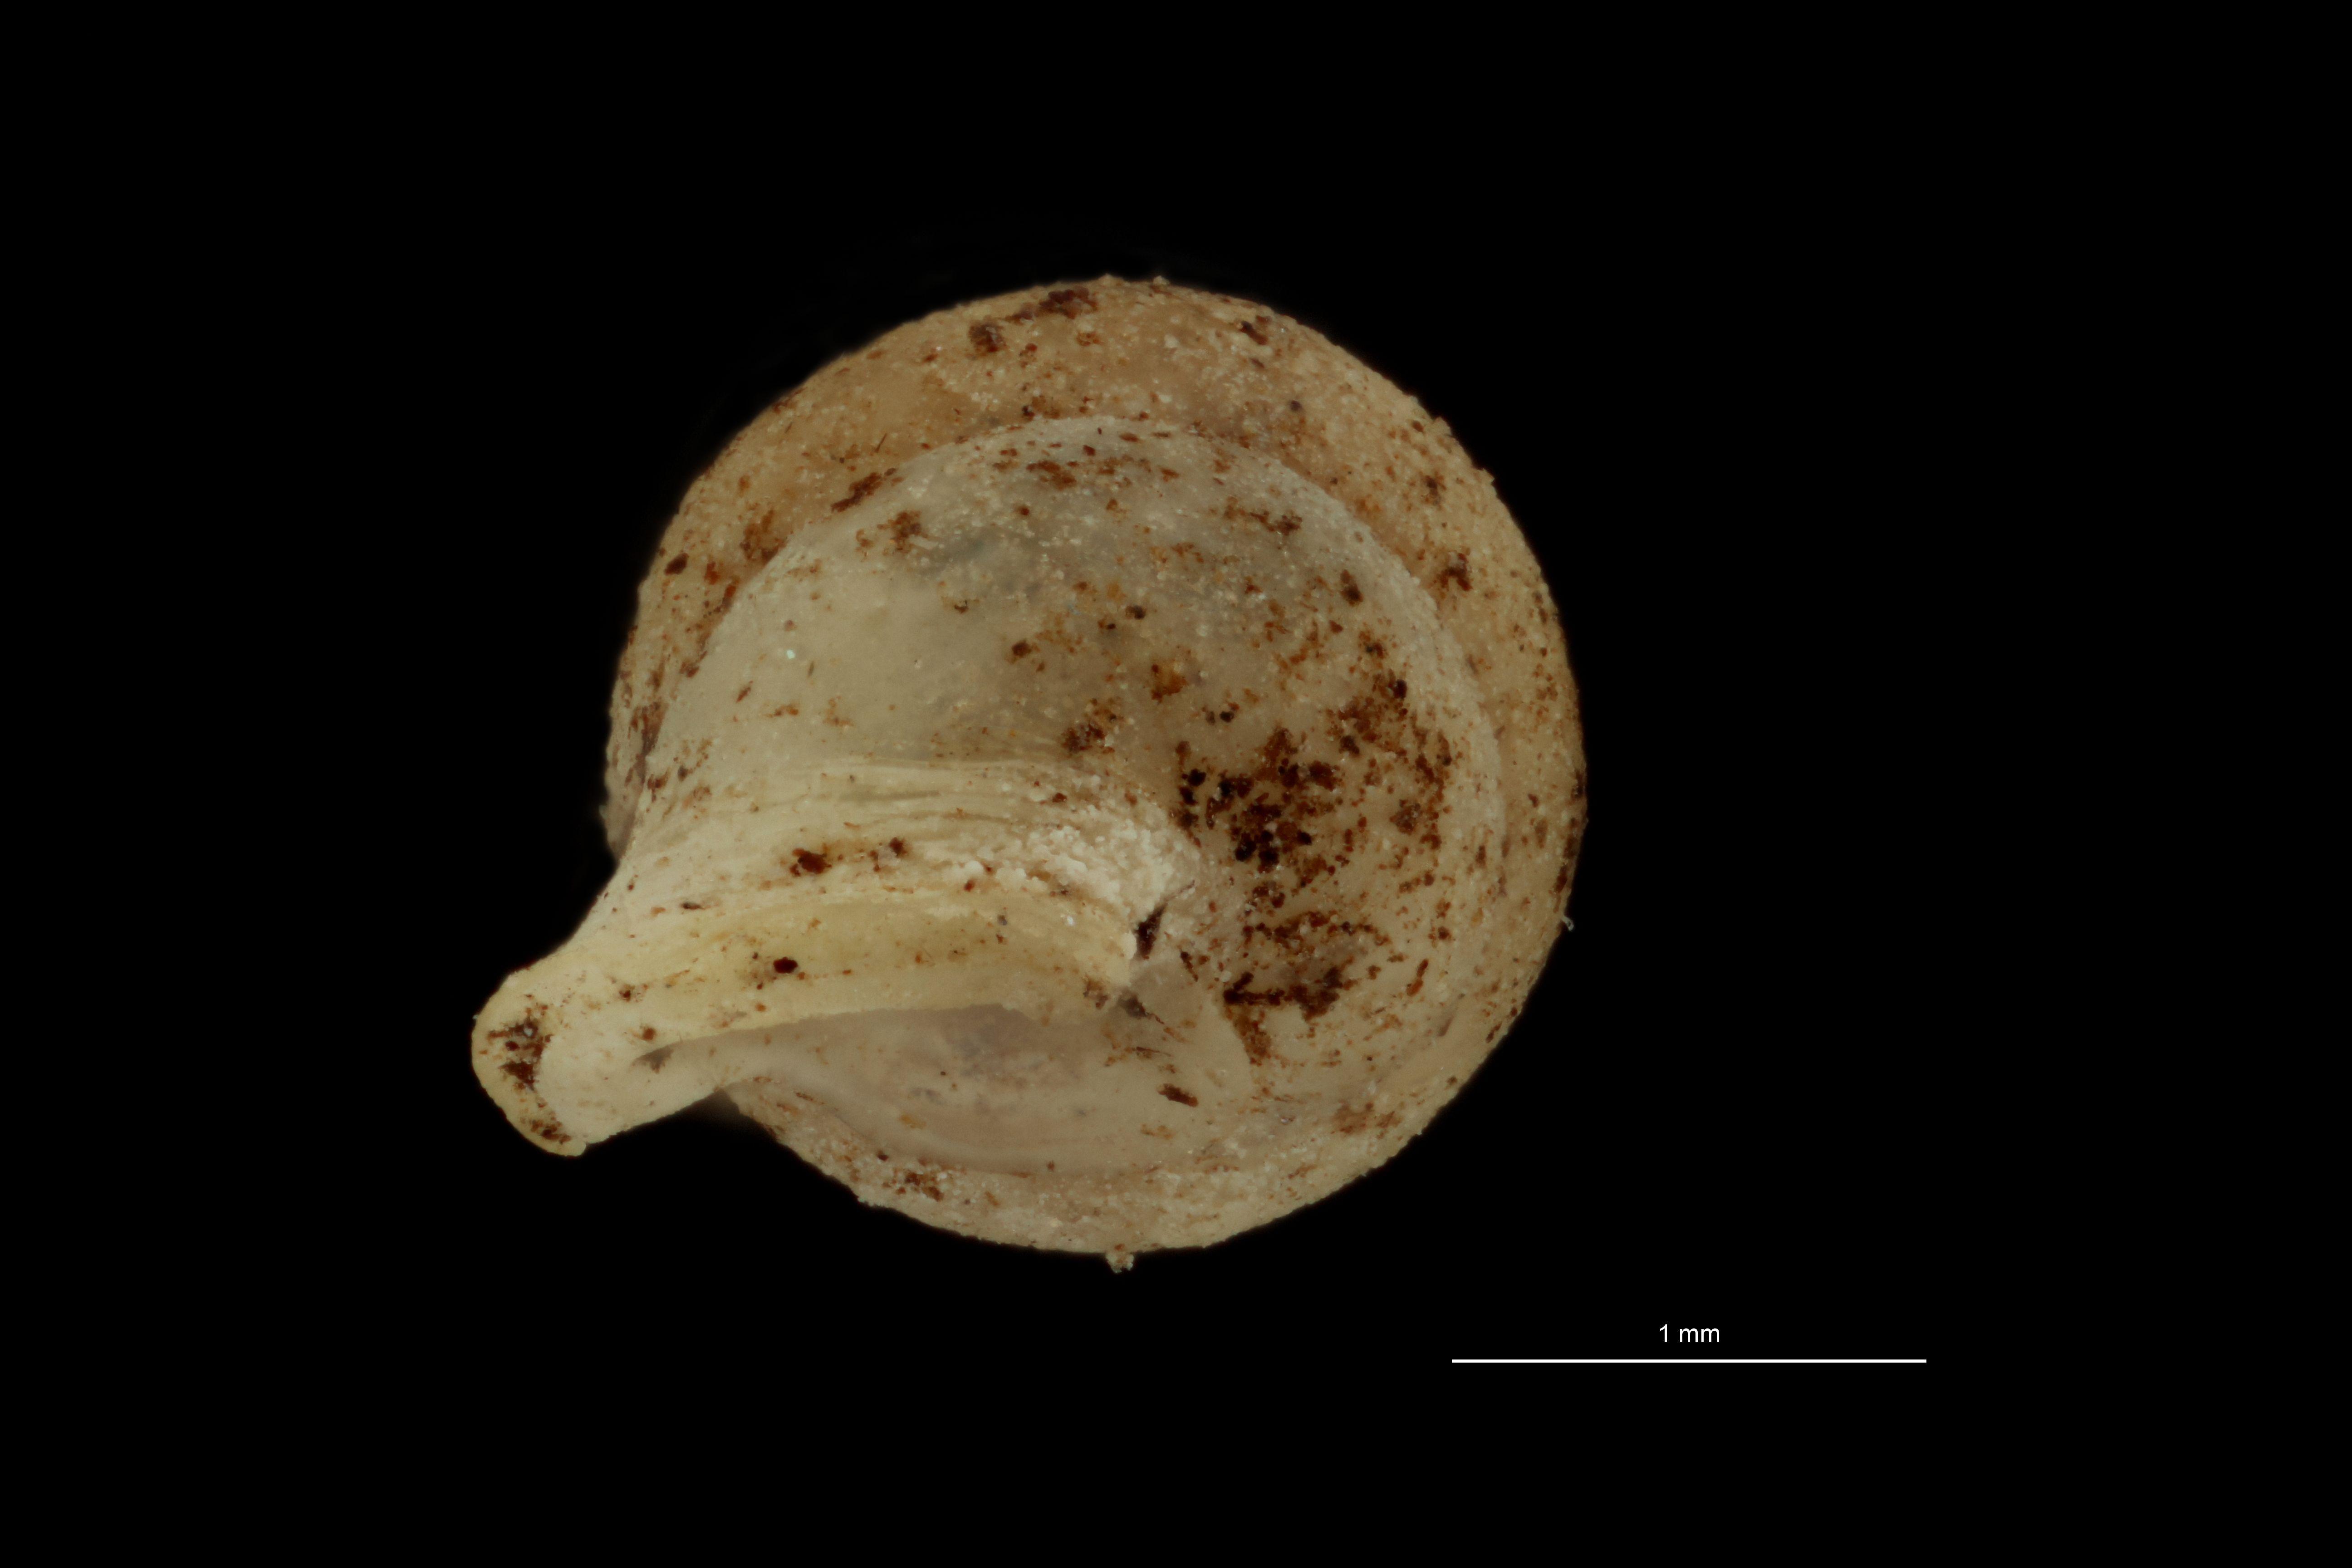 BE-RBINS-INV MT.1057/1 Diplommatina demangei pt U.jpg